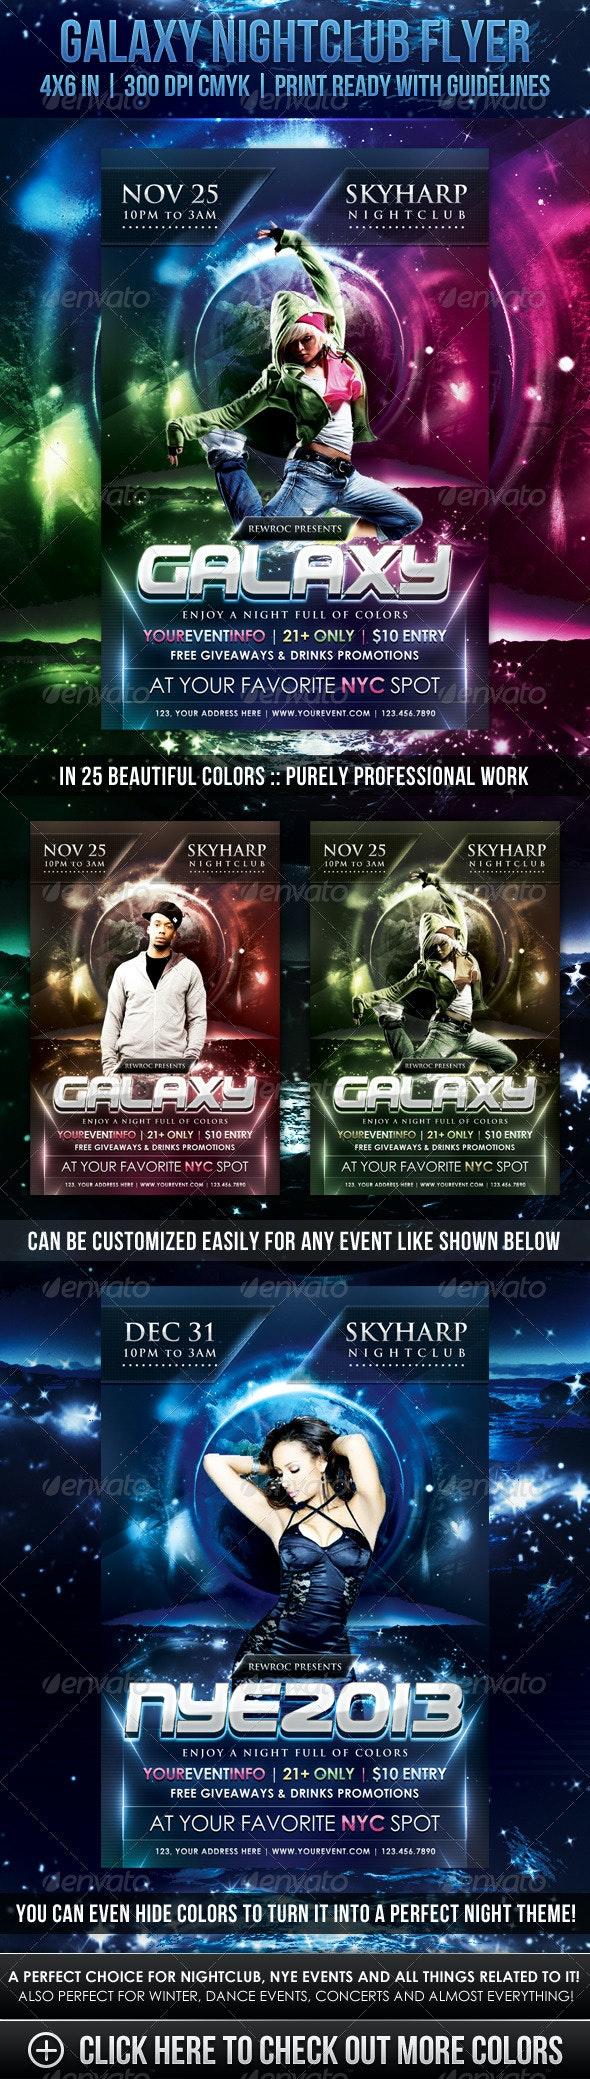 Galaxy Nightclub Flyer - Clubs & Parties Events